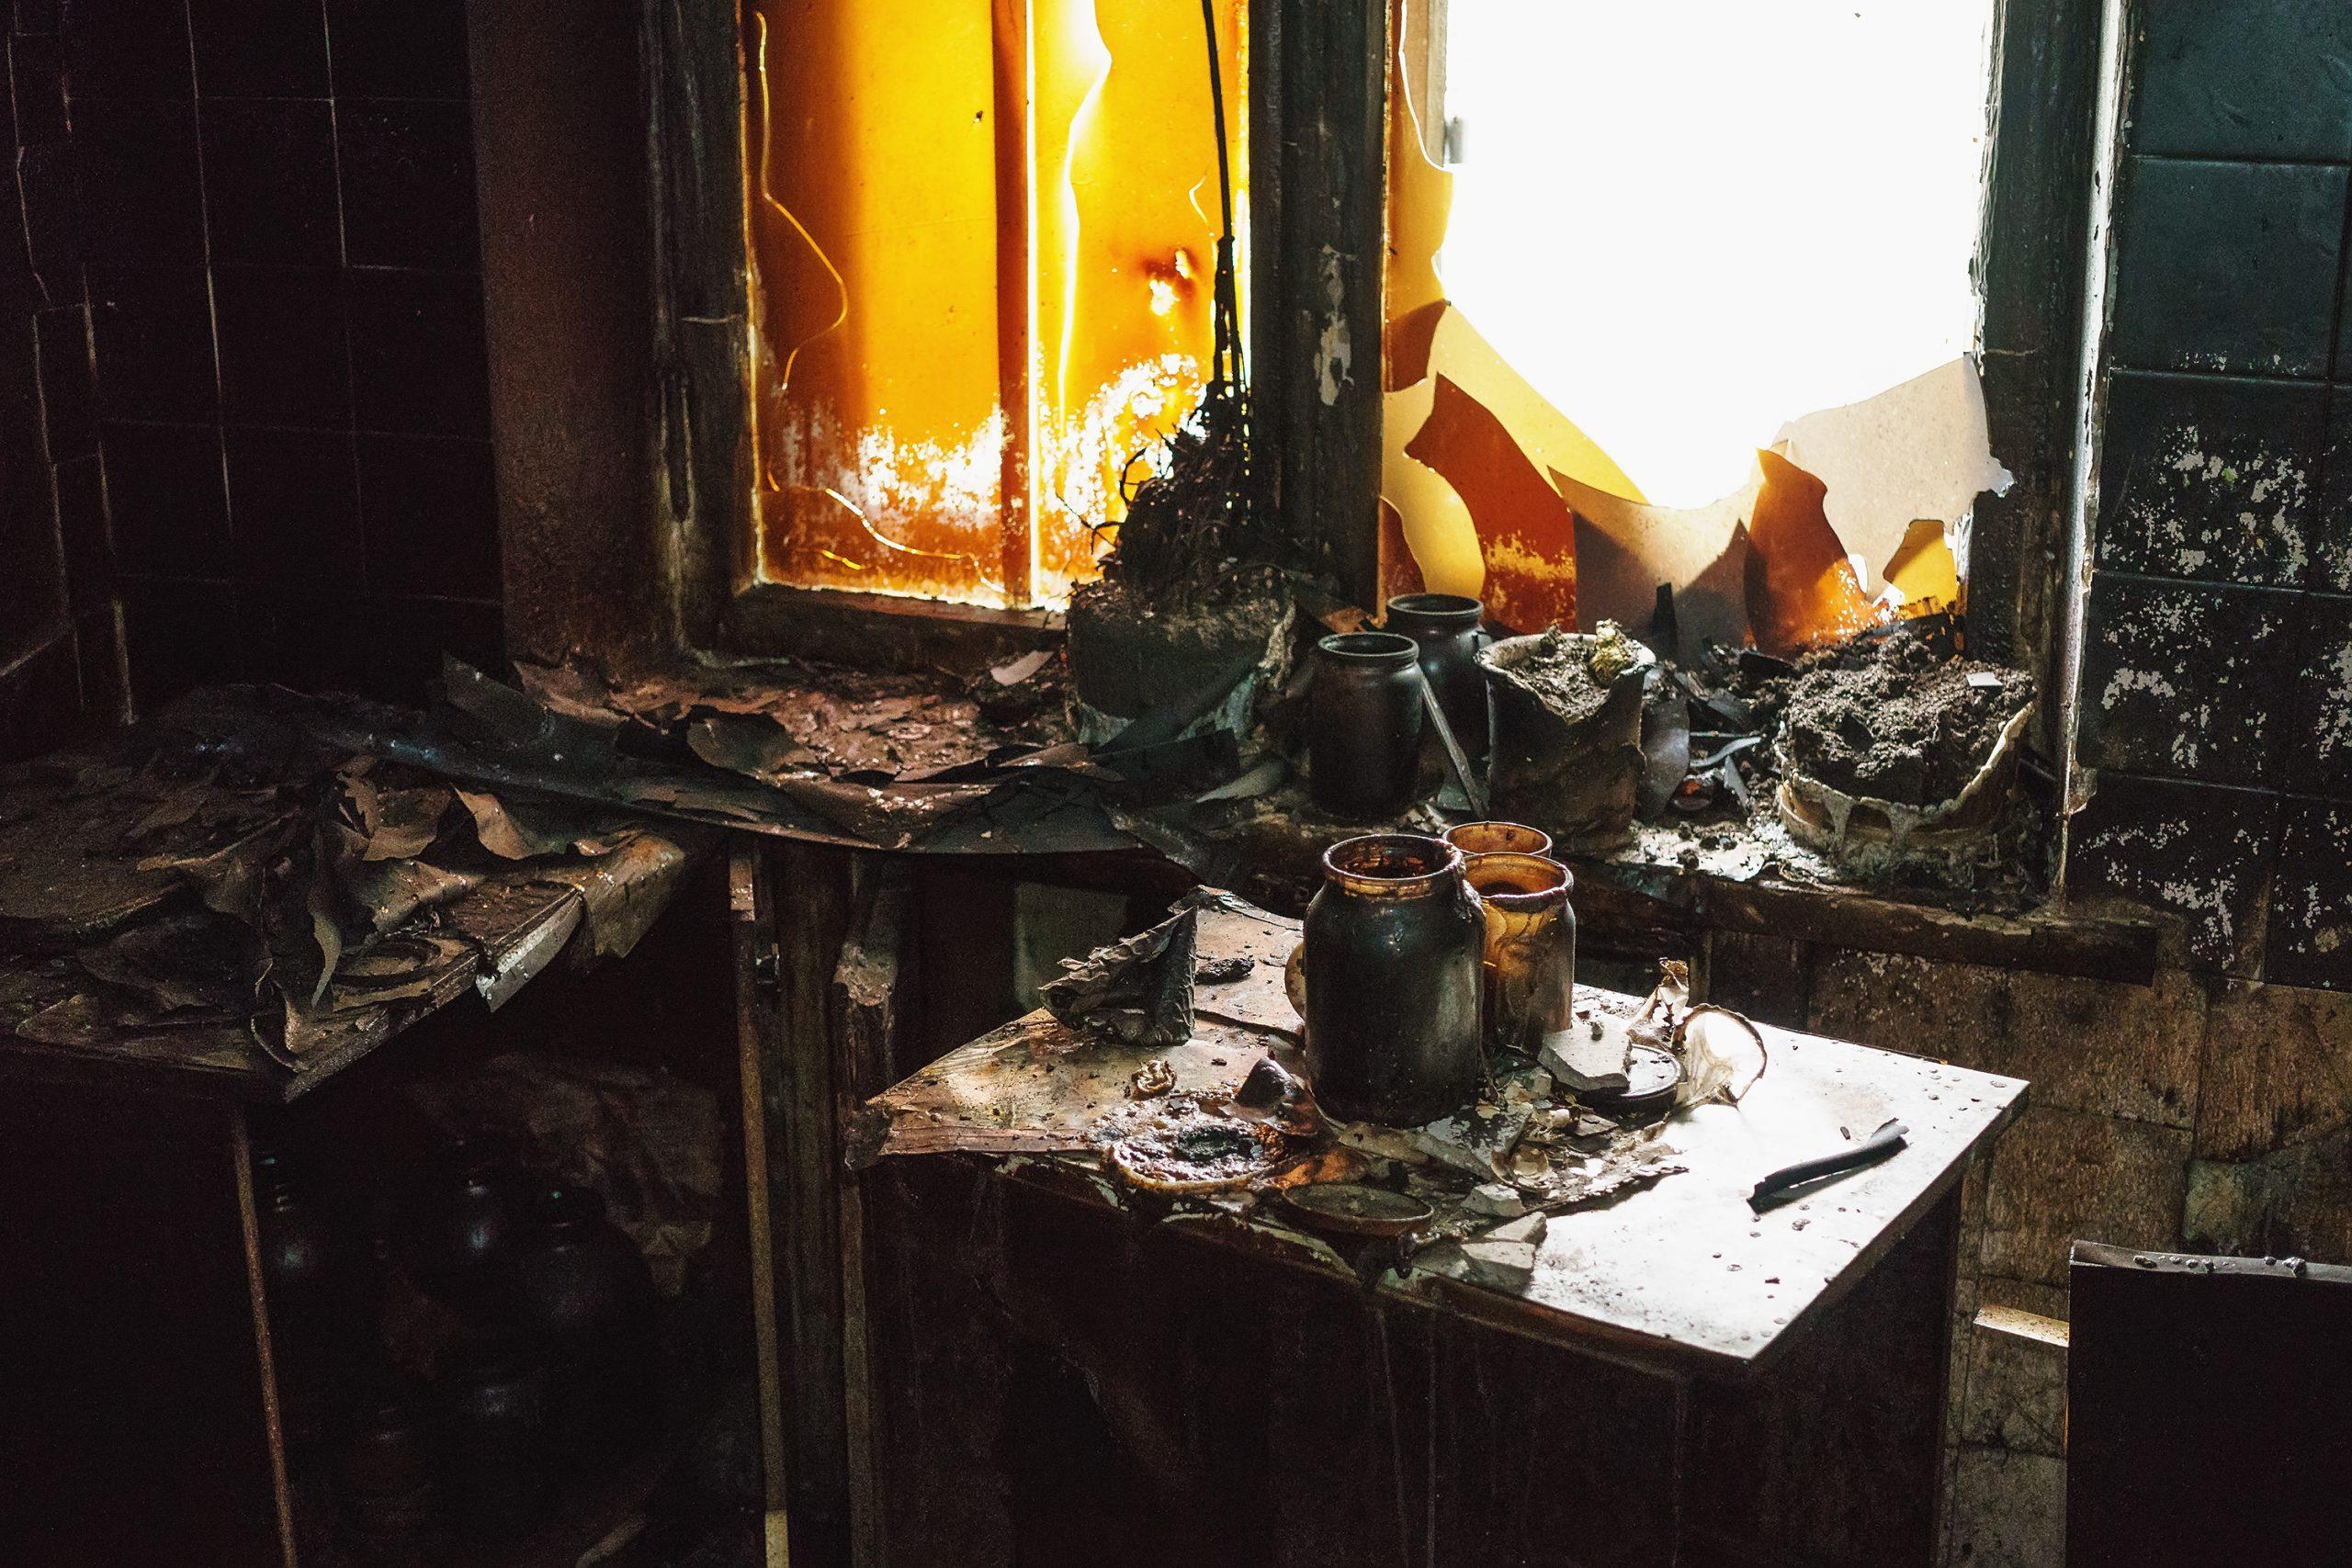 Interior inside the burnt room, furniture, utensils